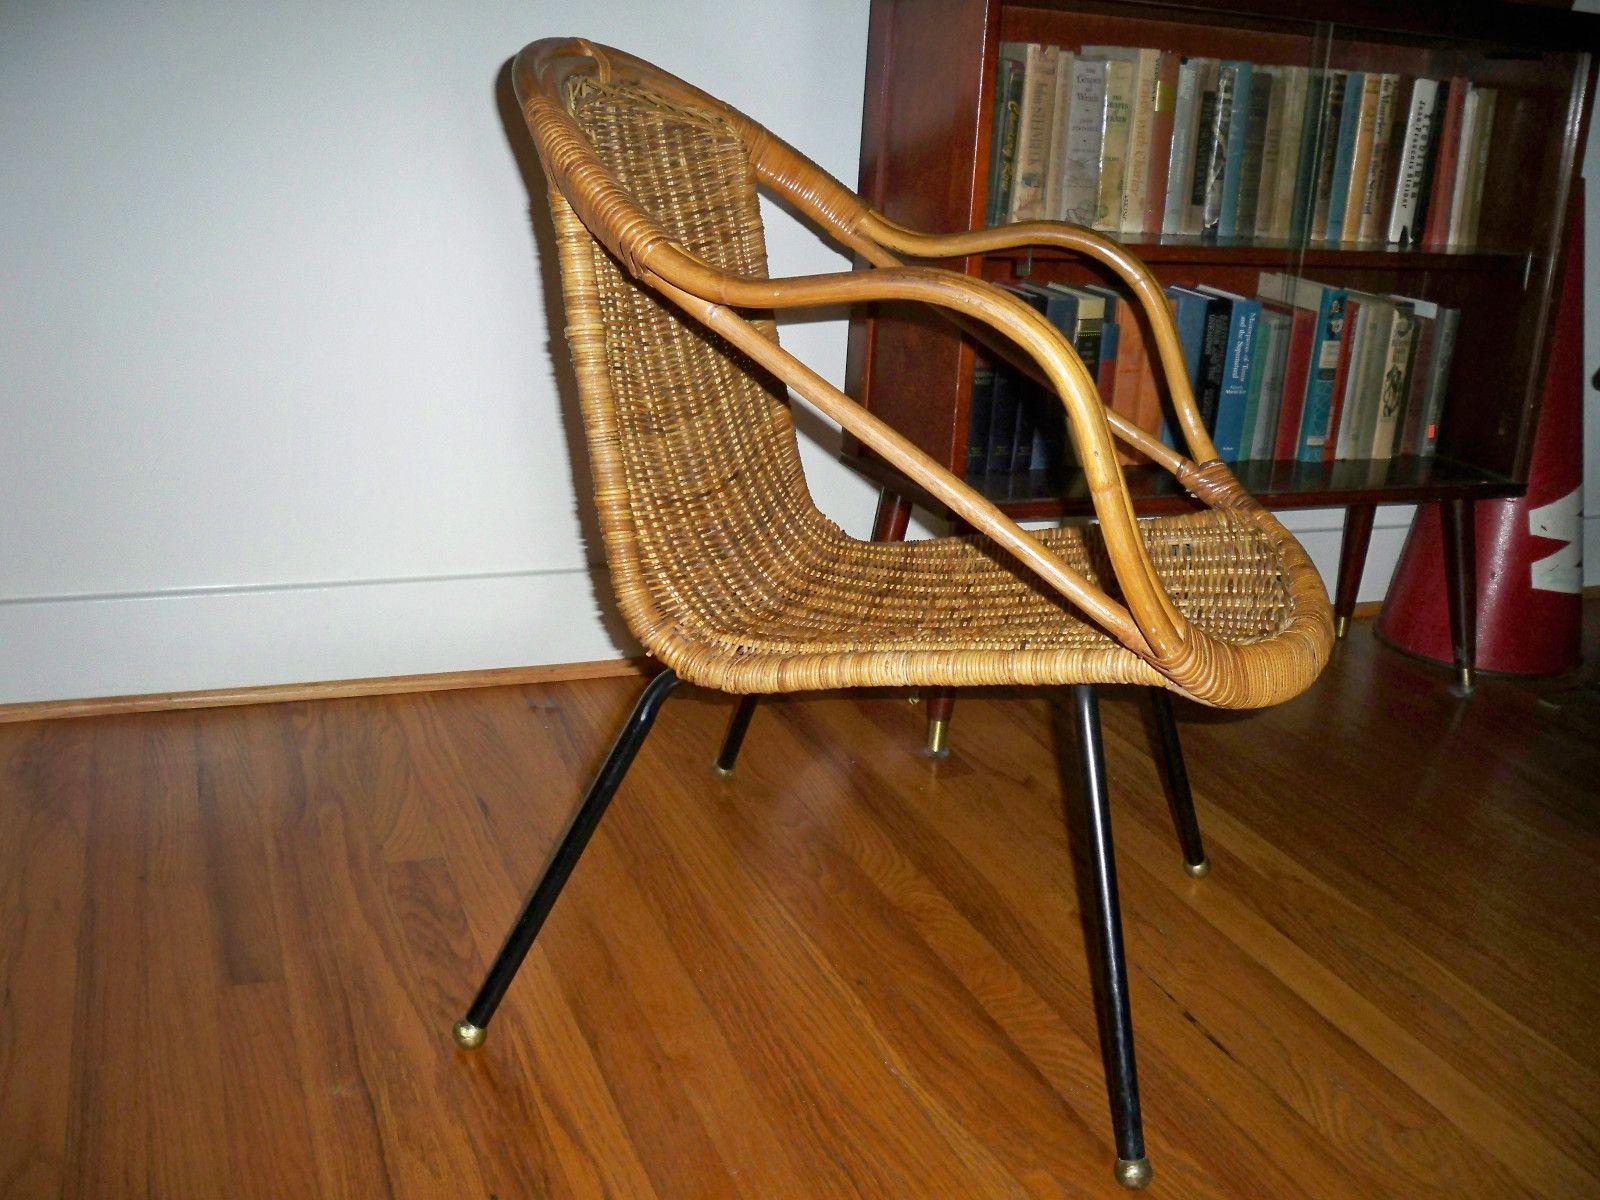 Vintage Retro Mid Century Danish Modern Wicker Rattan